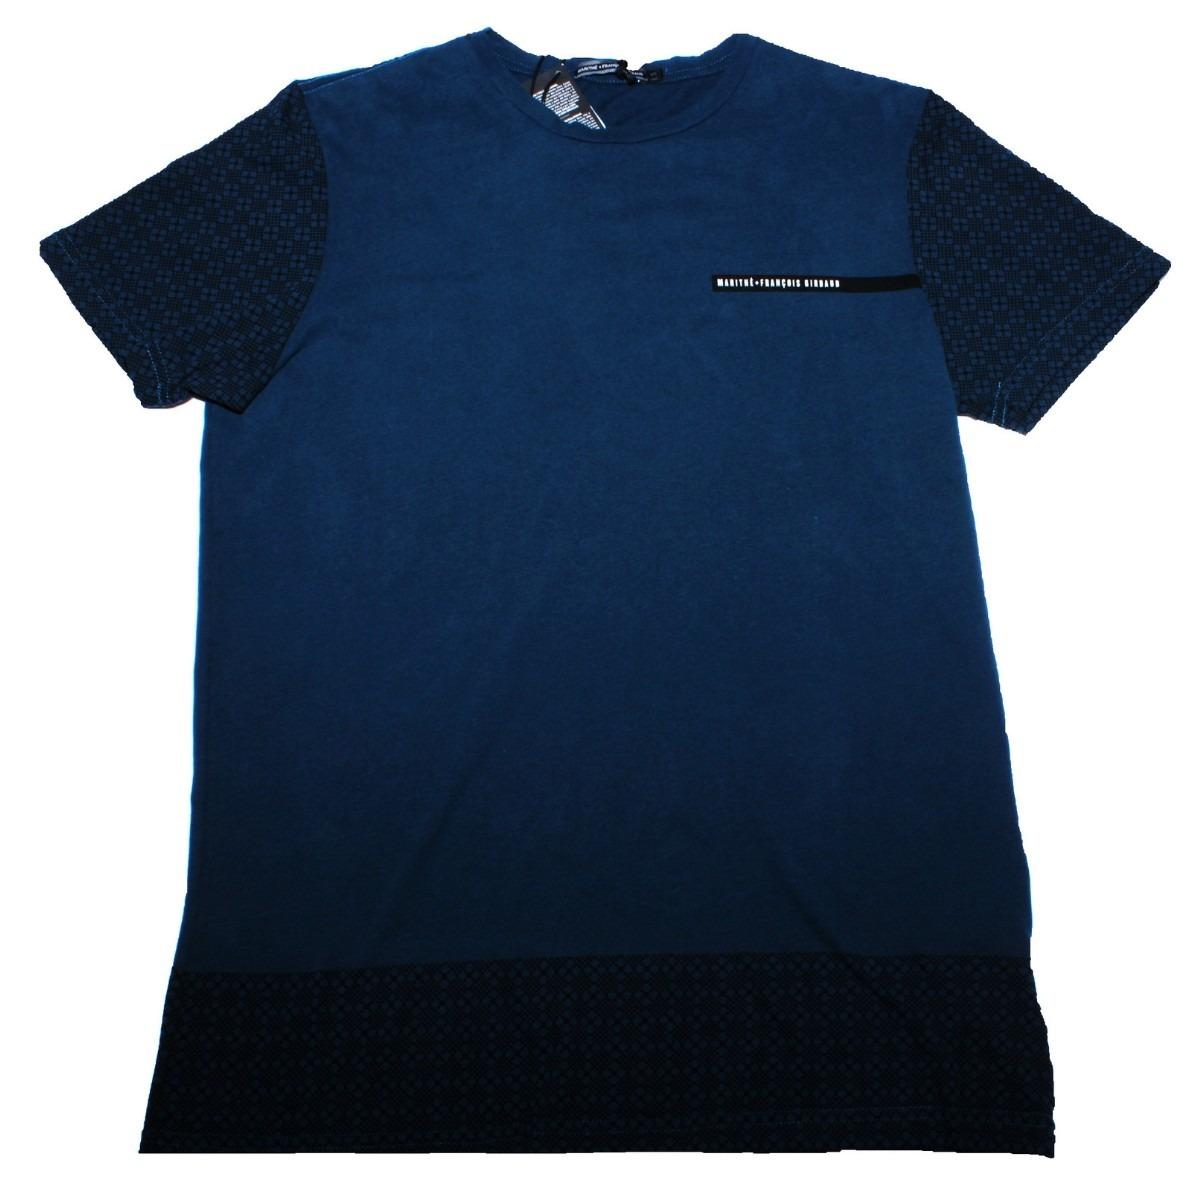 280672ea9b Camiseta Para Hombre De Marithe + Francois Girbaud - U S 25